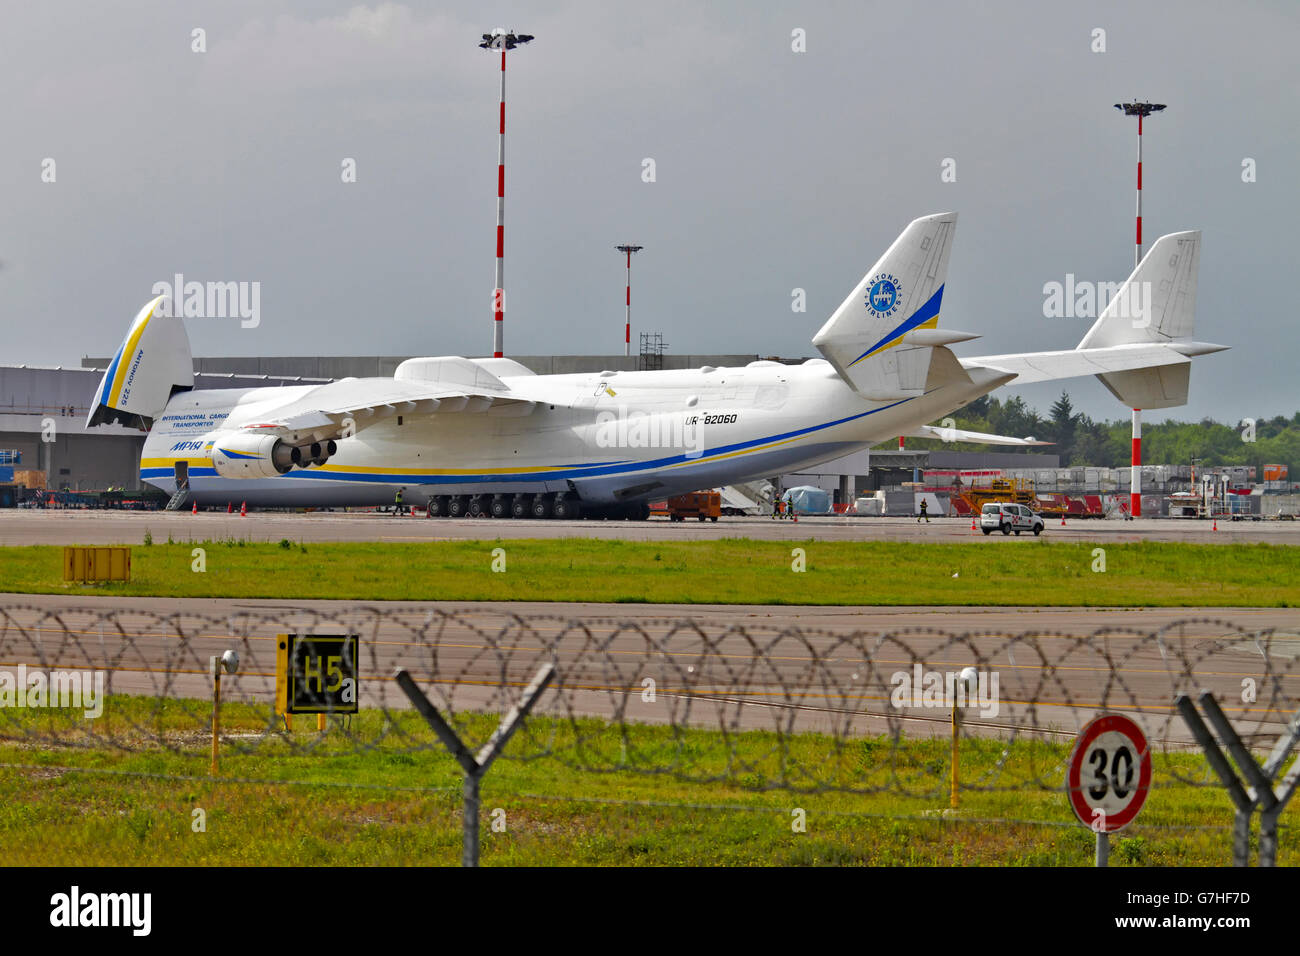 Antonov An-225 Mriya in flight - Stock Image